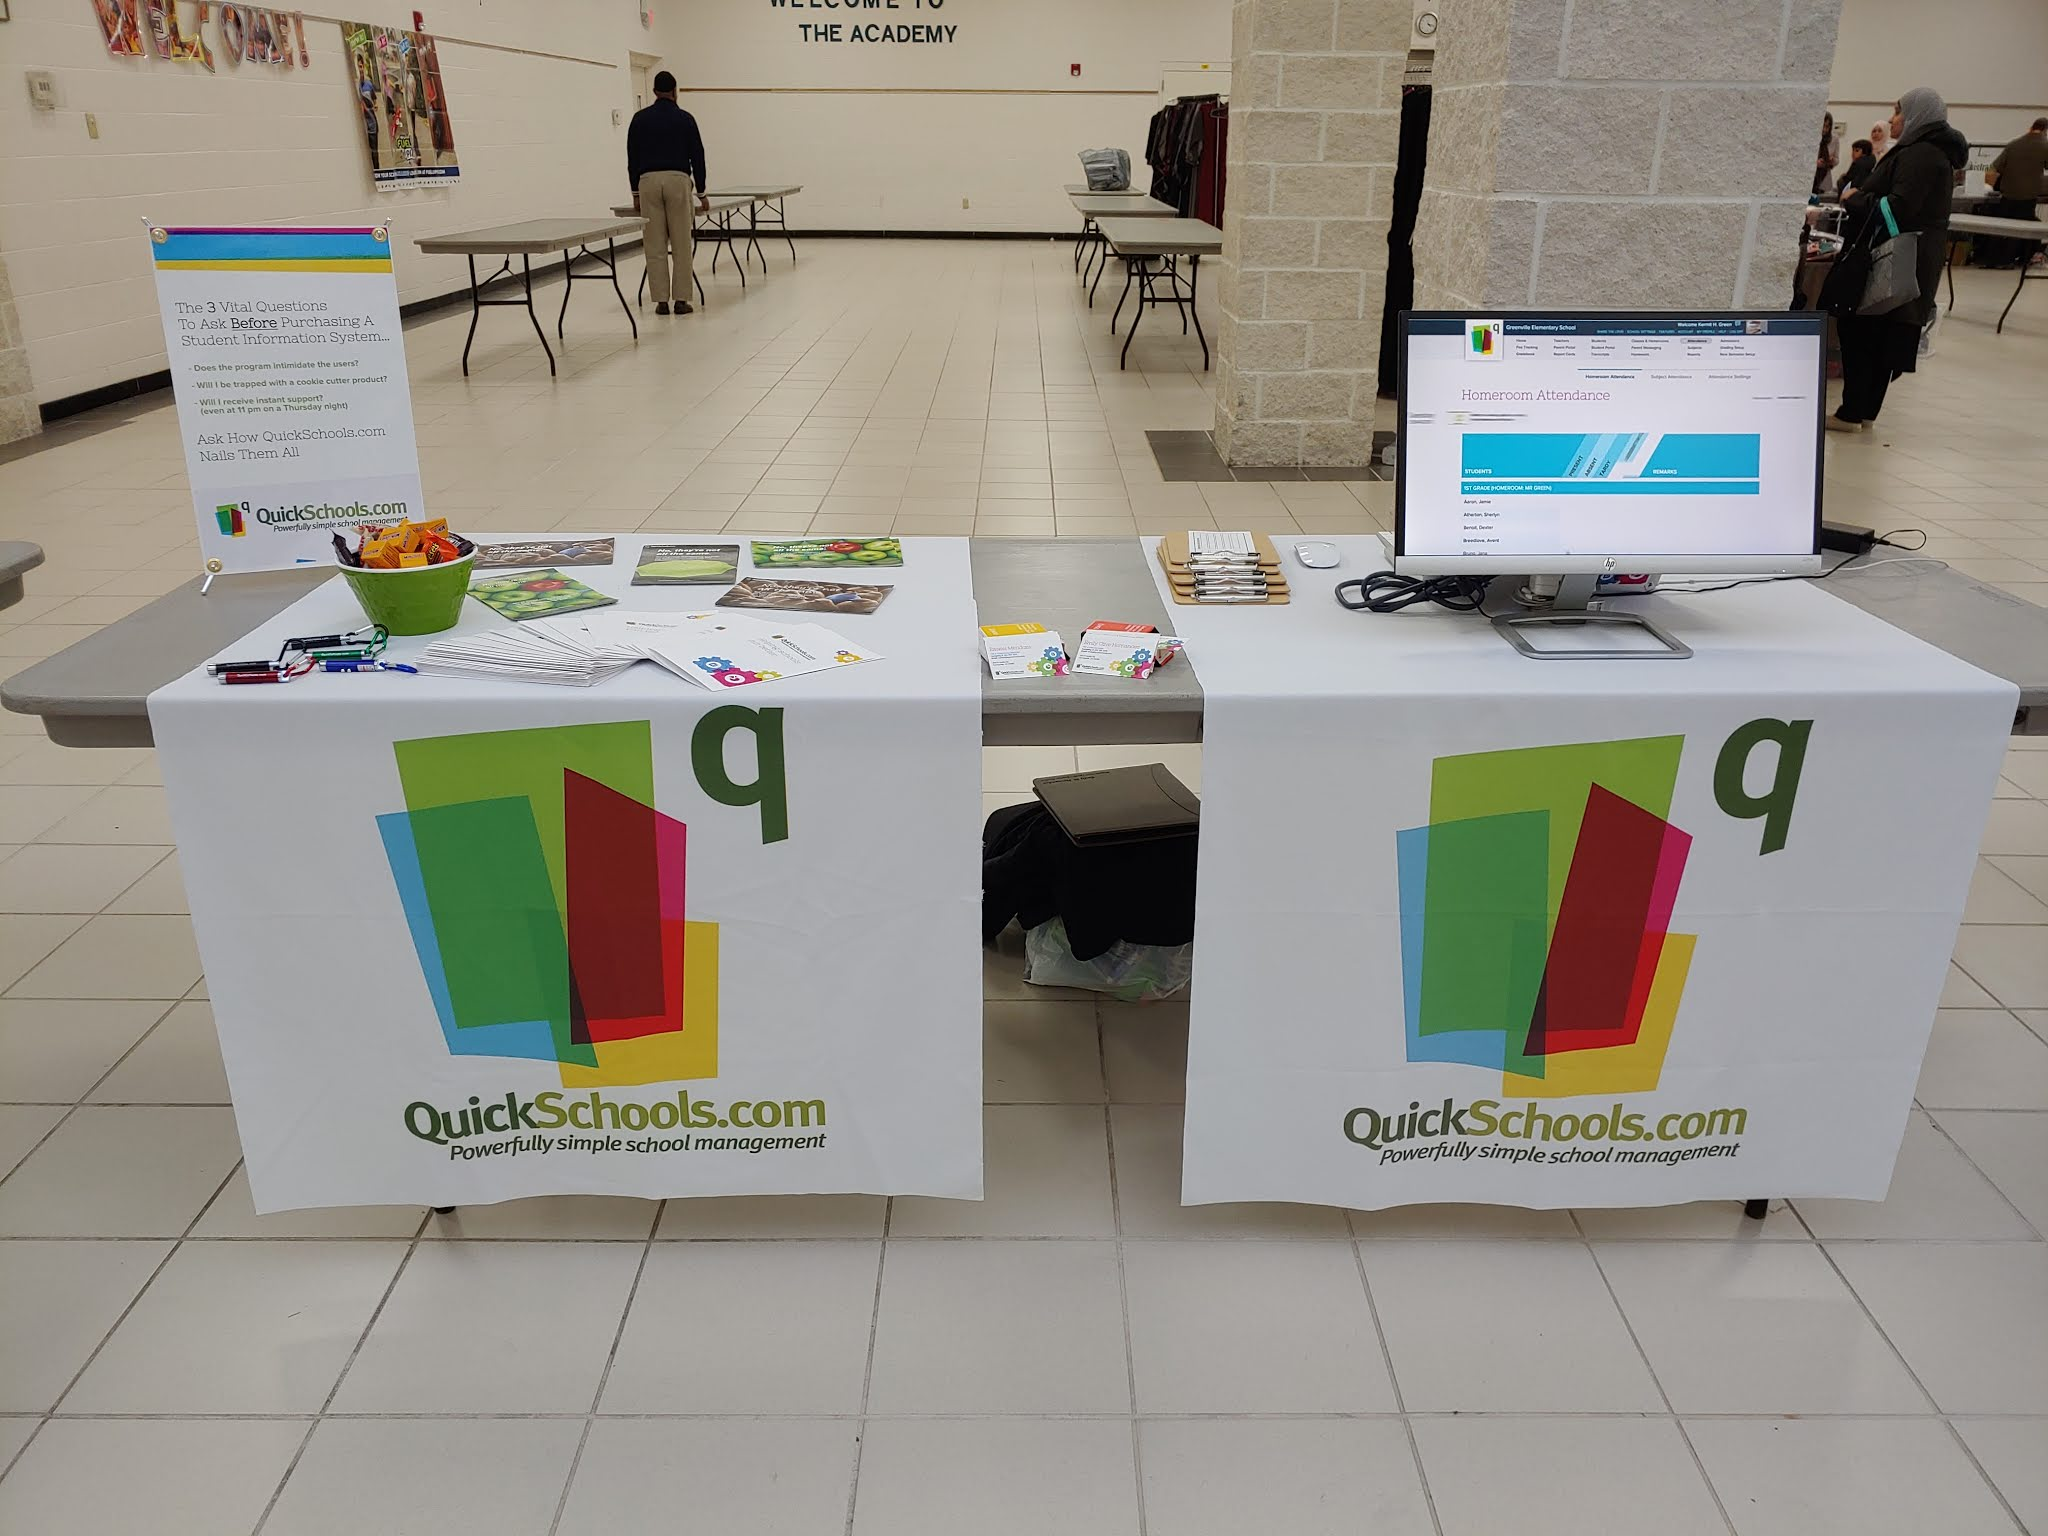 QuickSchools at ISNA Ohio Regional Conference